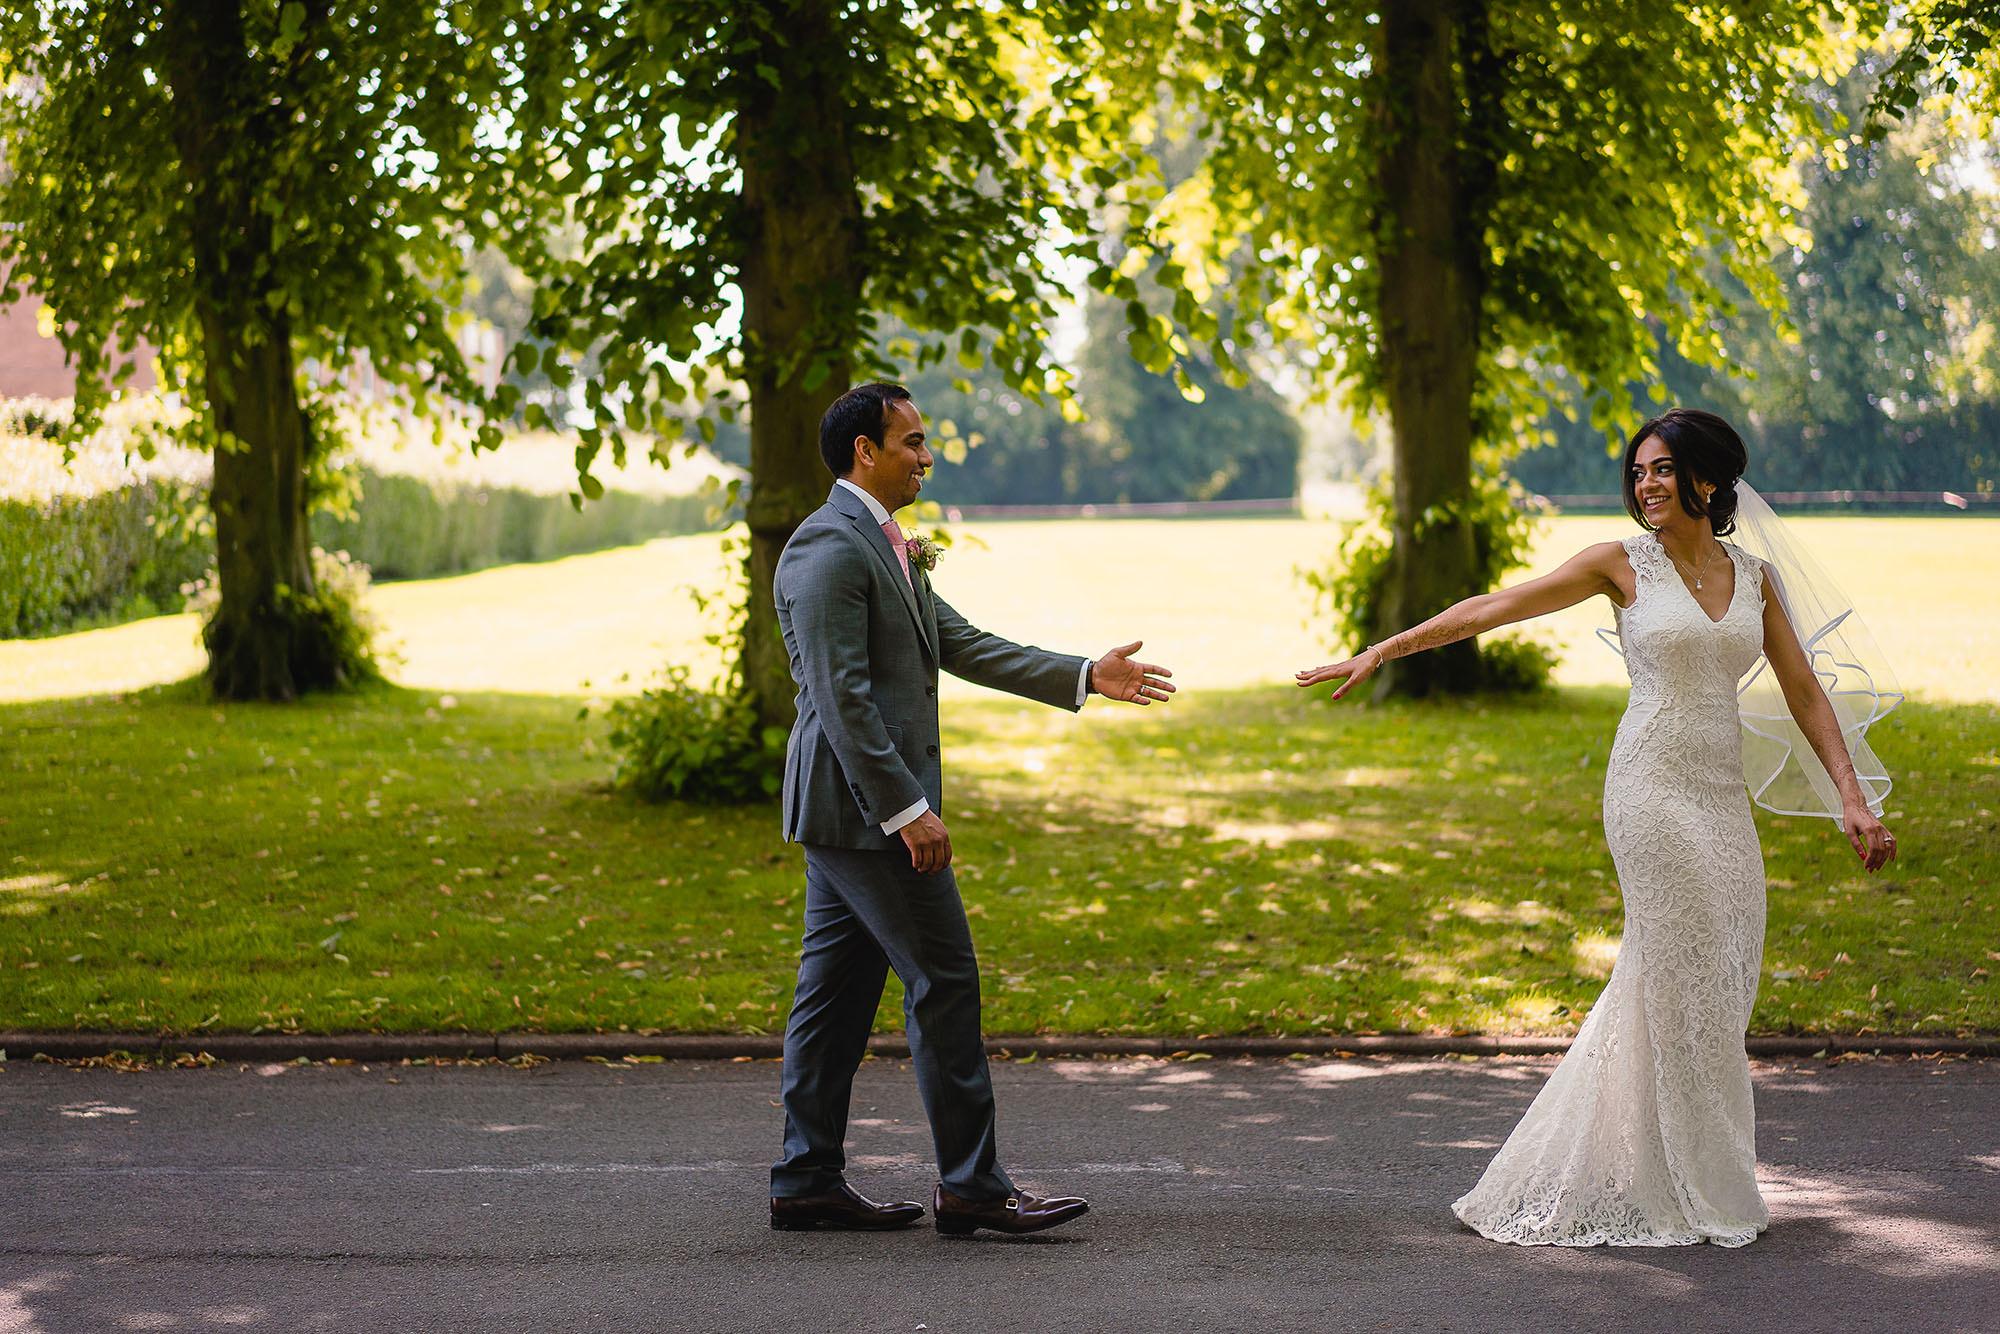 bride leading the groom